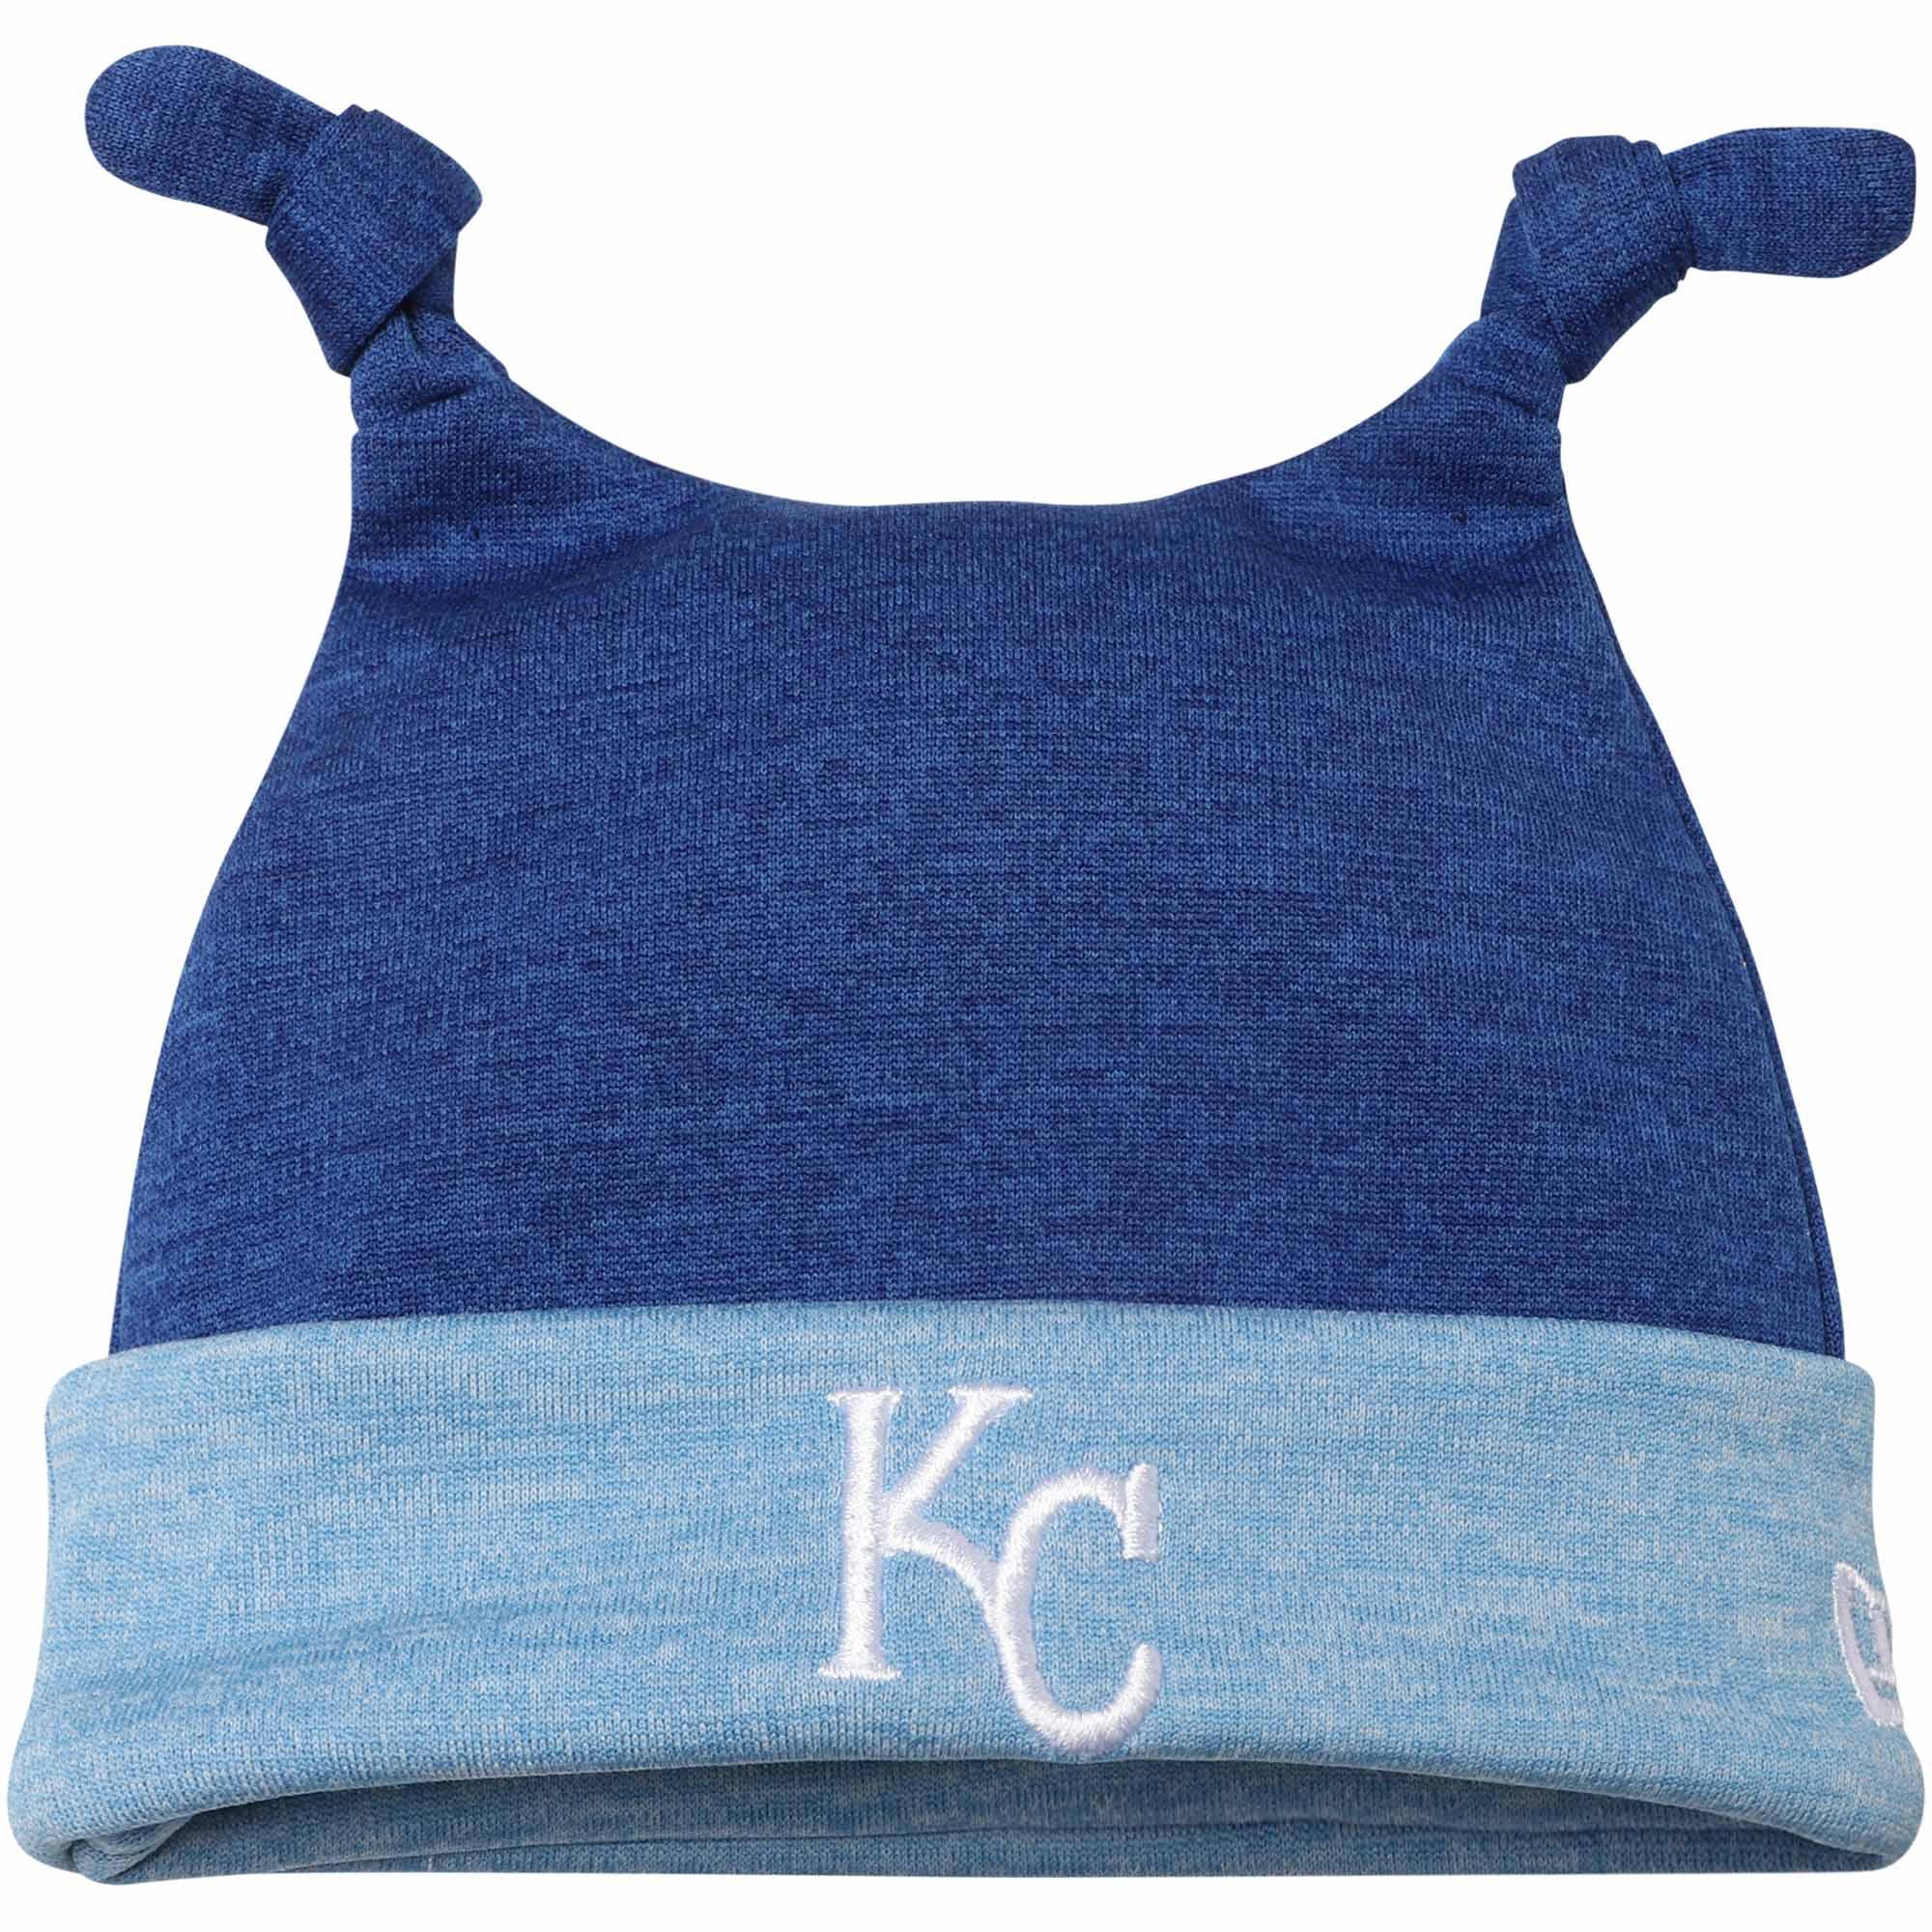 Kansas City Royals New Era Newborn Shadow Tot Dub Cuffed Knit Hat - Royal - OSFA